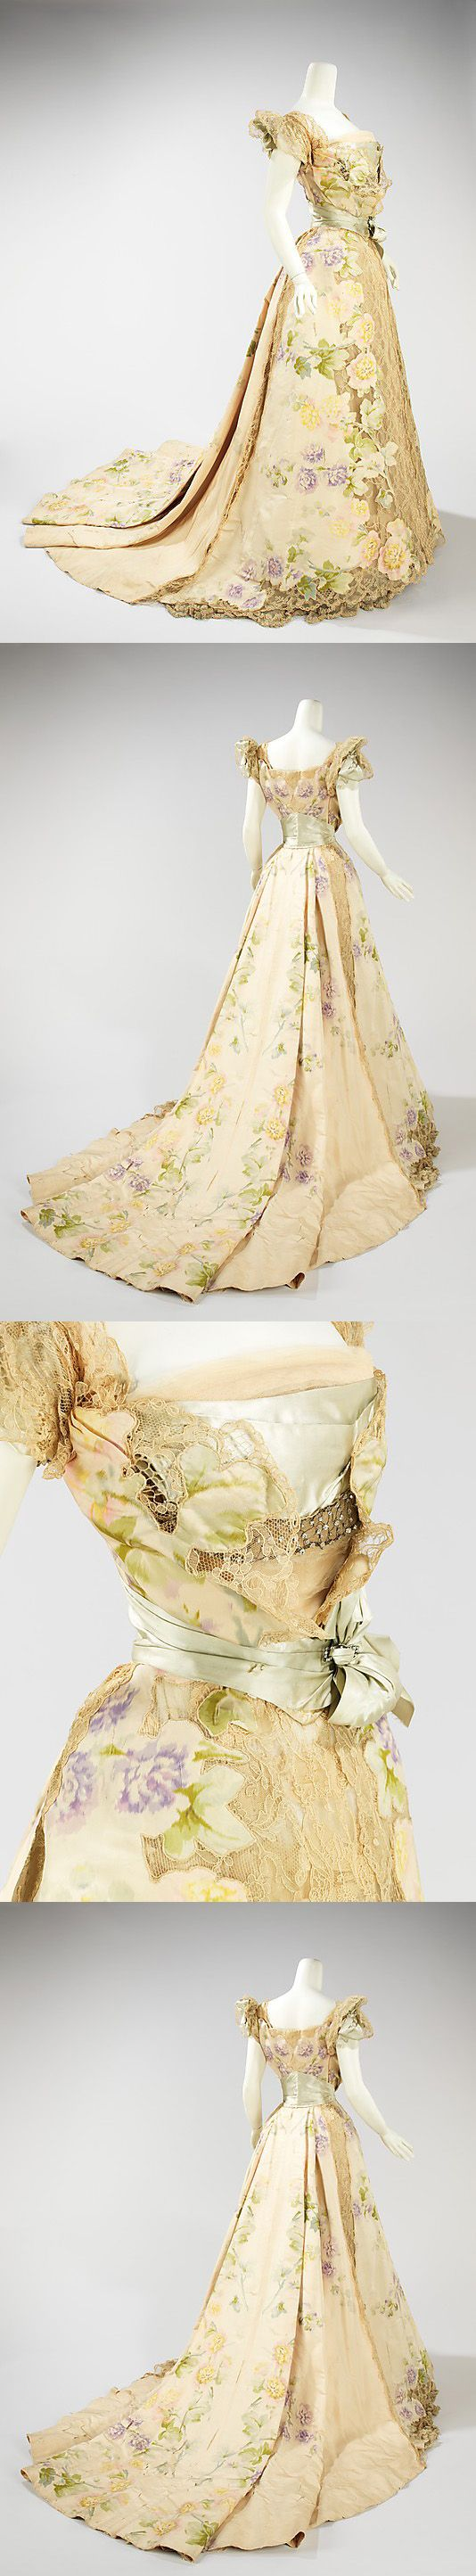 Evening dress, House of Worth, 1902.